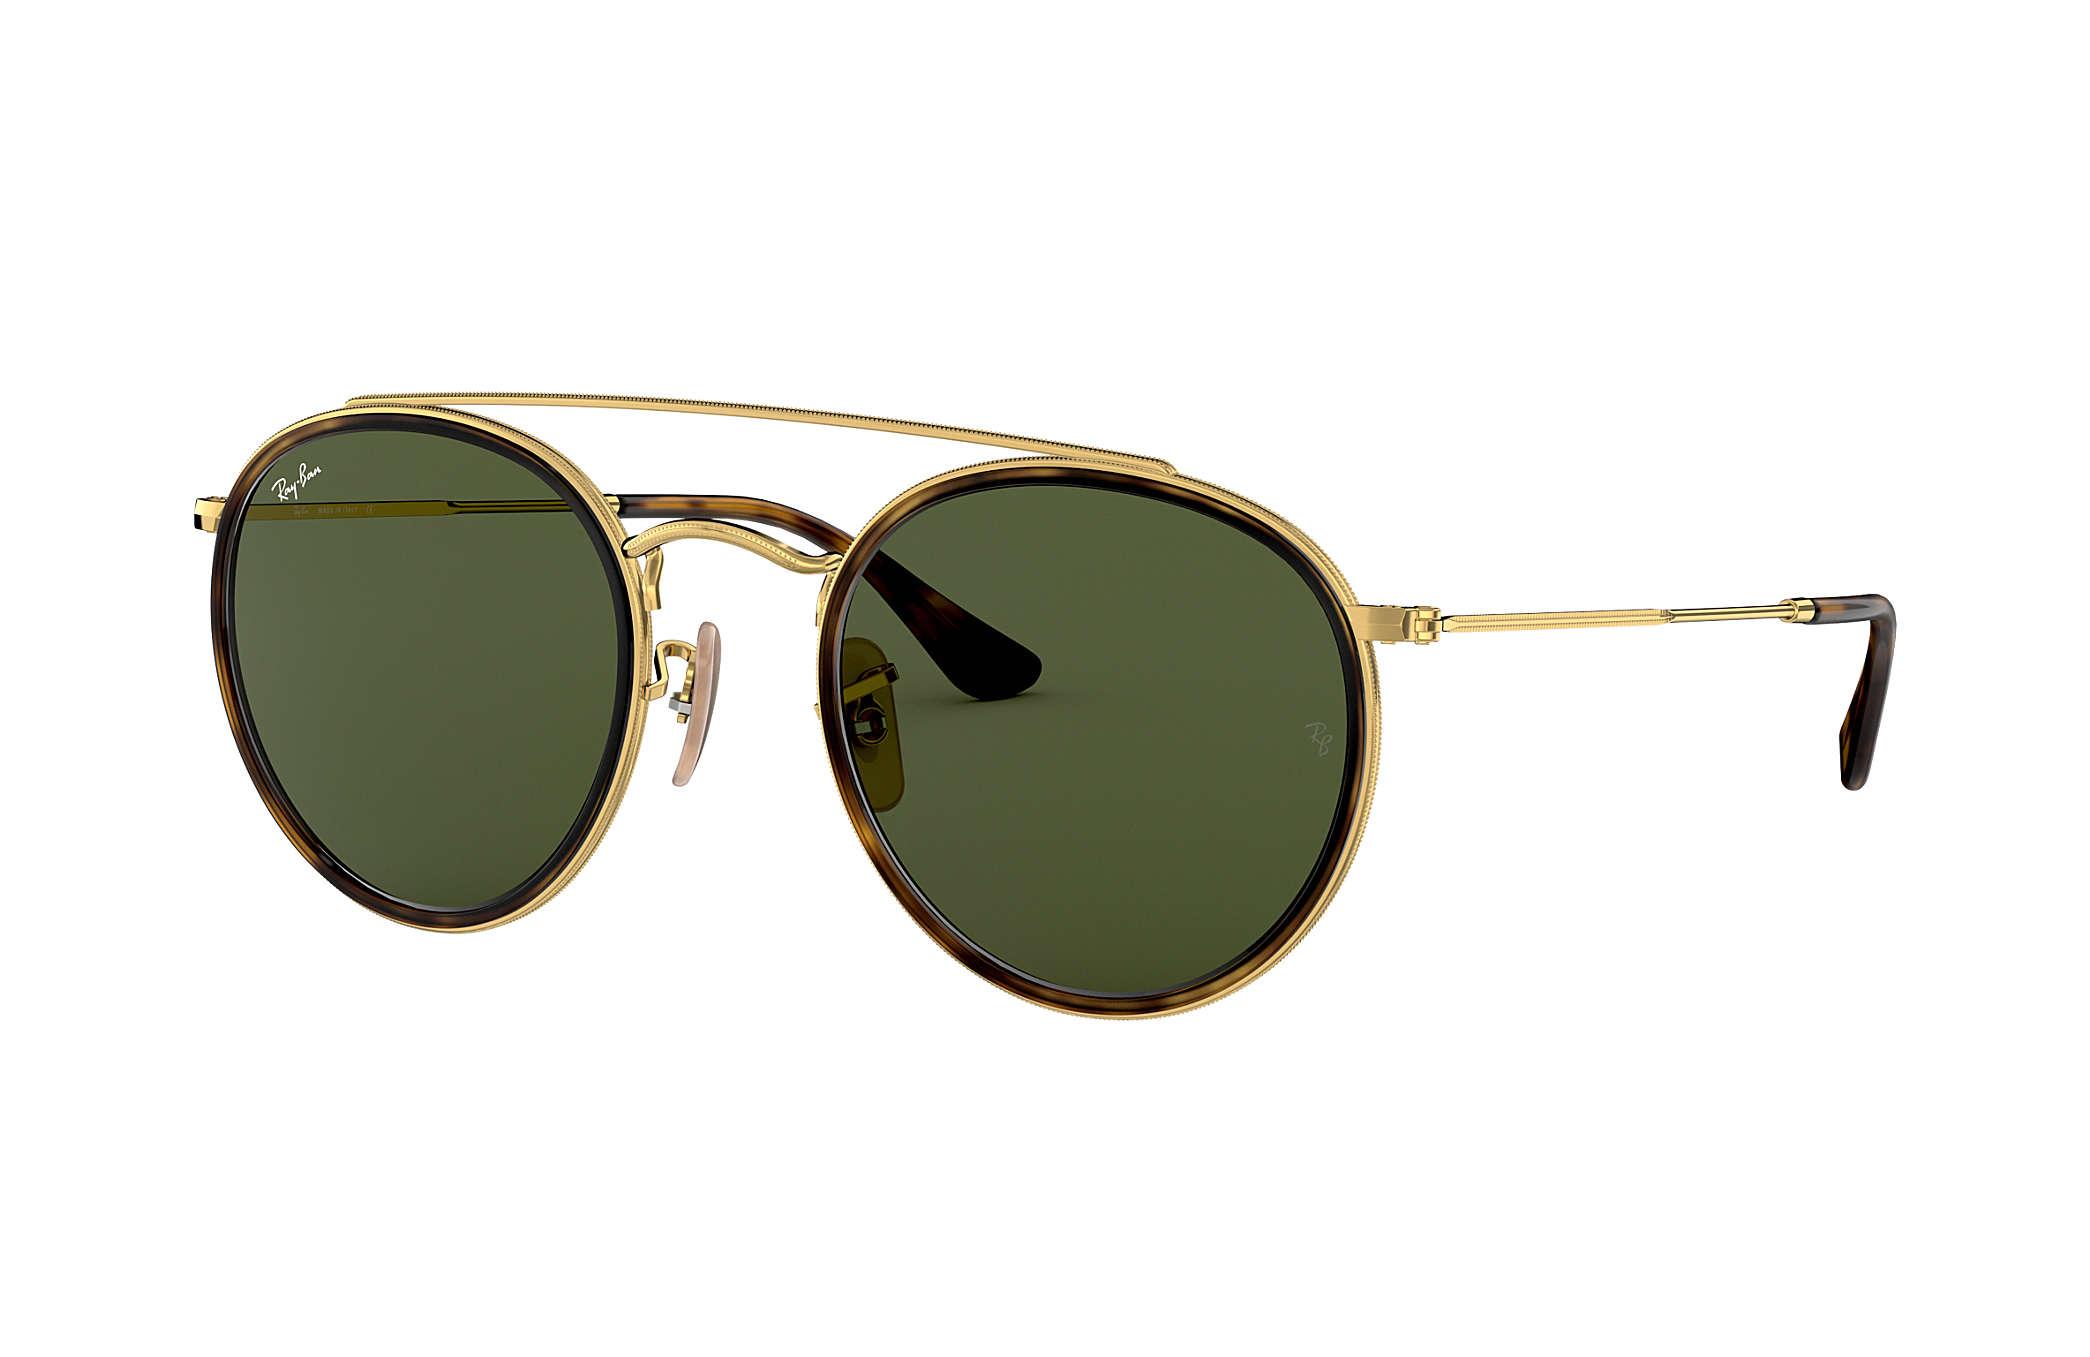 90366b774462 Ray-Ban Round Double Bridge RB3647N Gold - Metal - Green Lenses ...